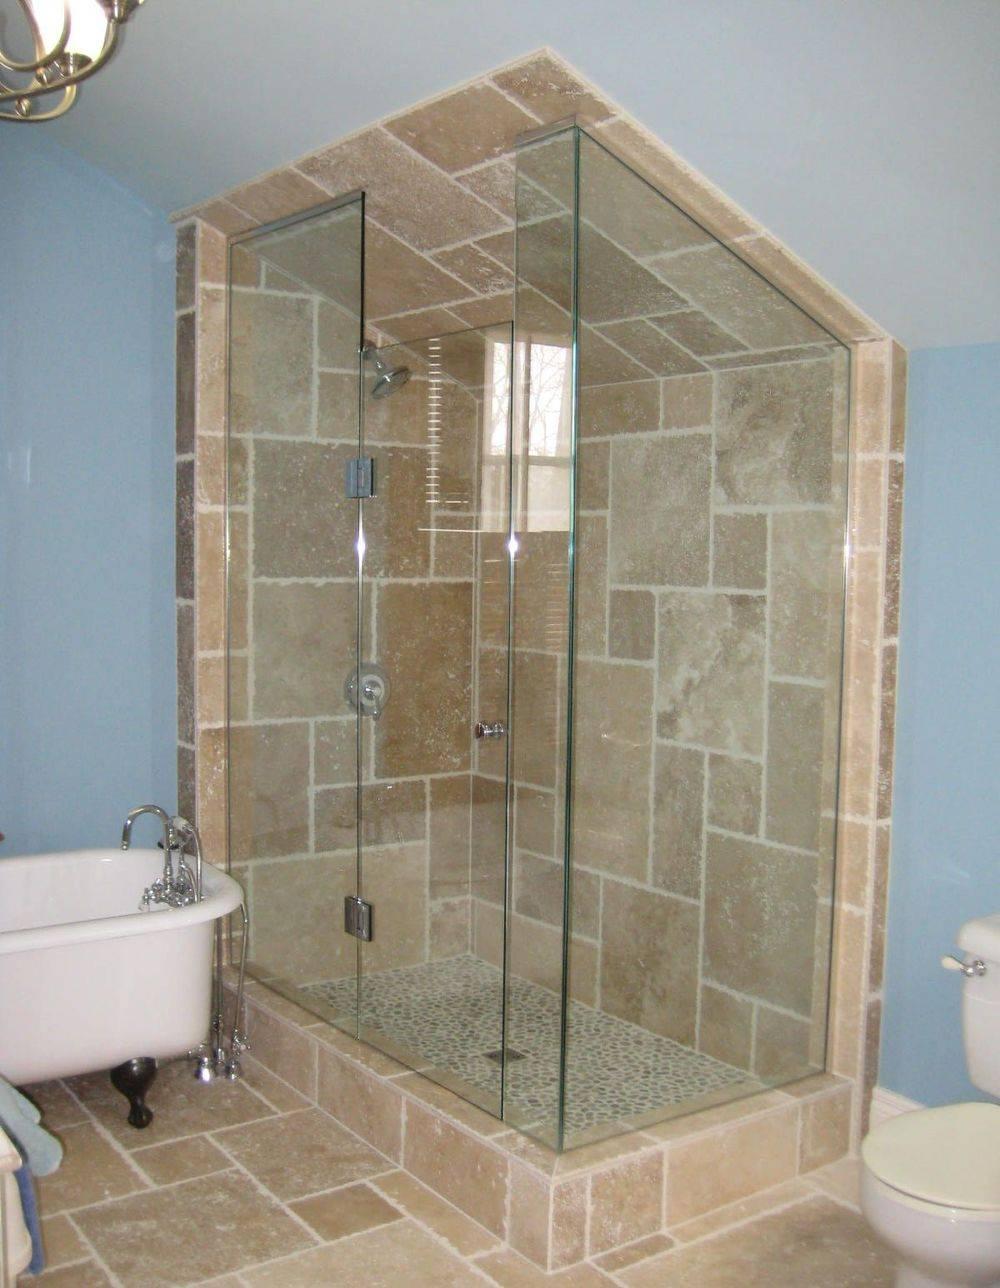 Frameless Glass Shower Enclosure , Markhan Richmond Hill, Toronto, Newmarket, Pickering, Uxbridge